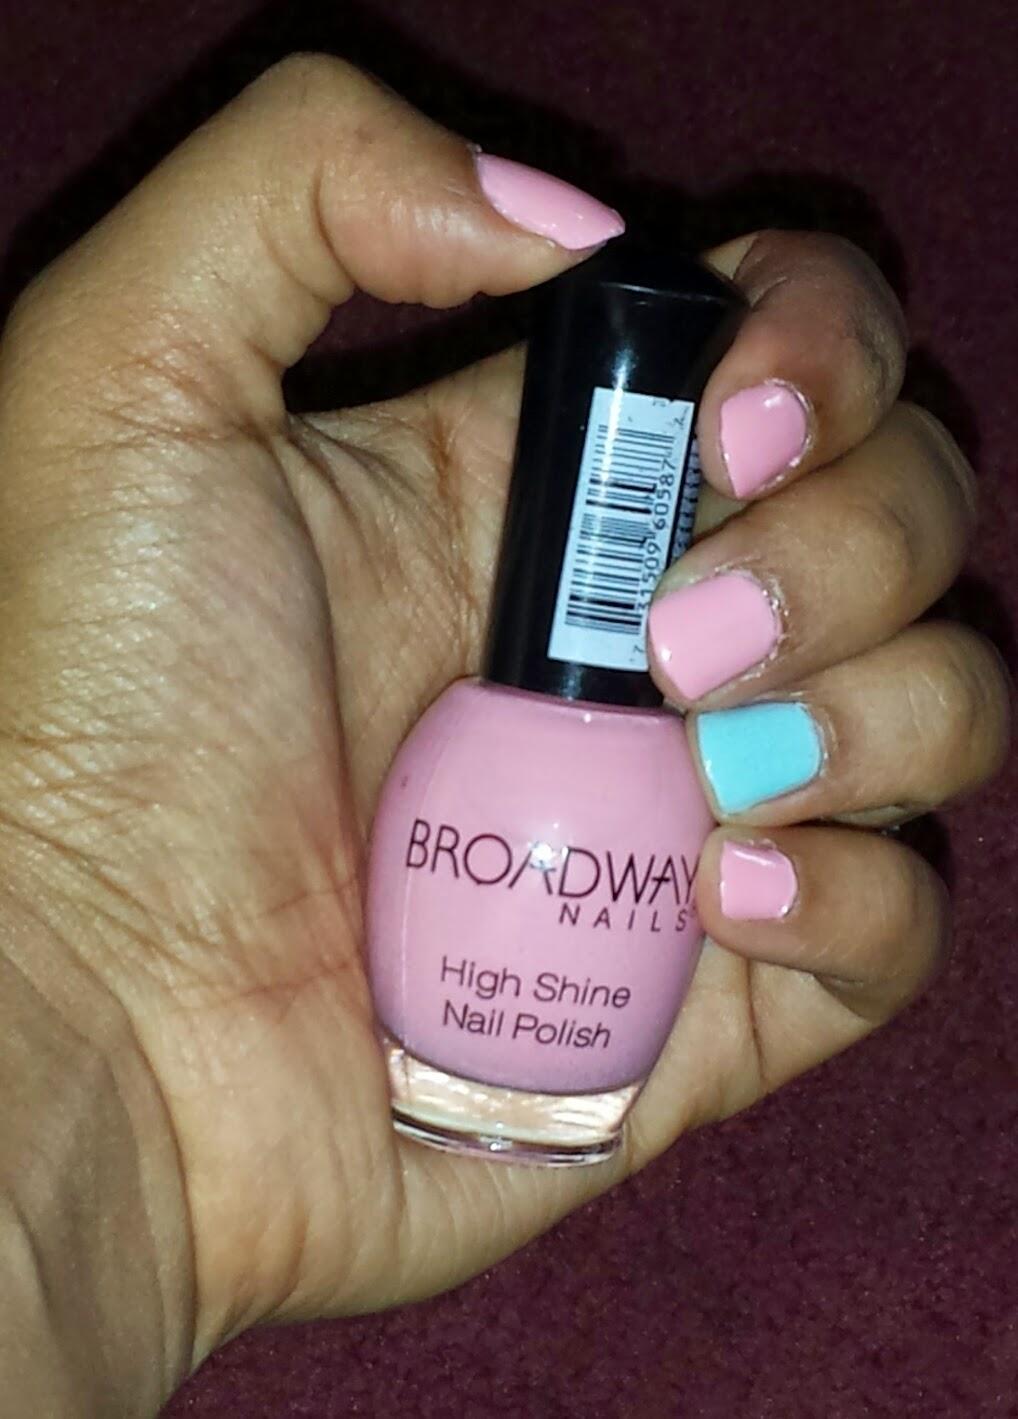 BronzedSouthernBeauty: $1 Find! Broadway Nails High Shine